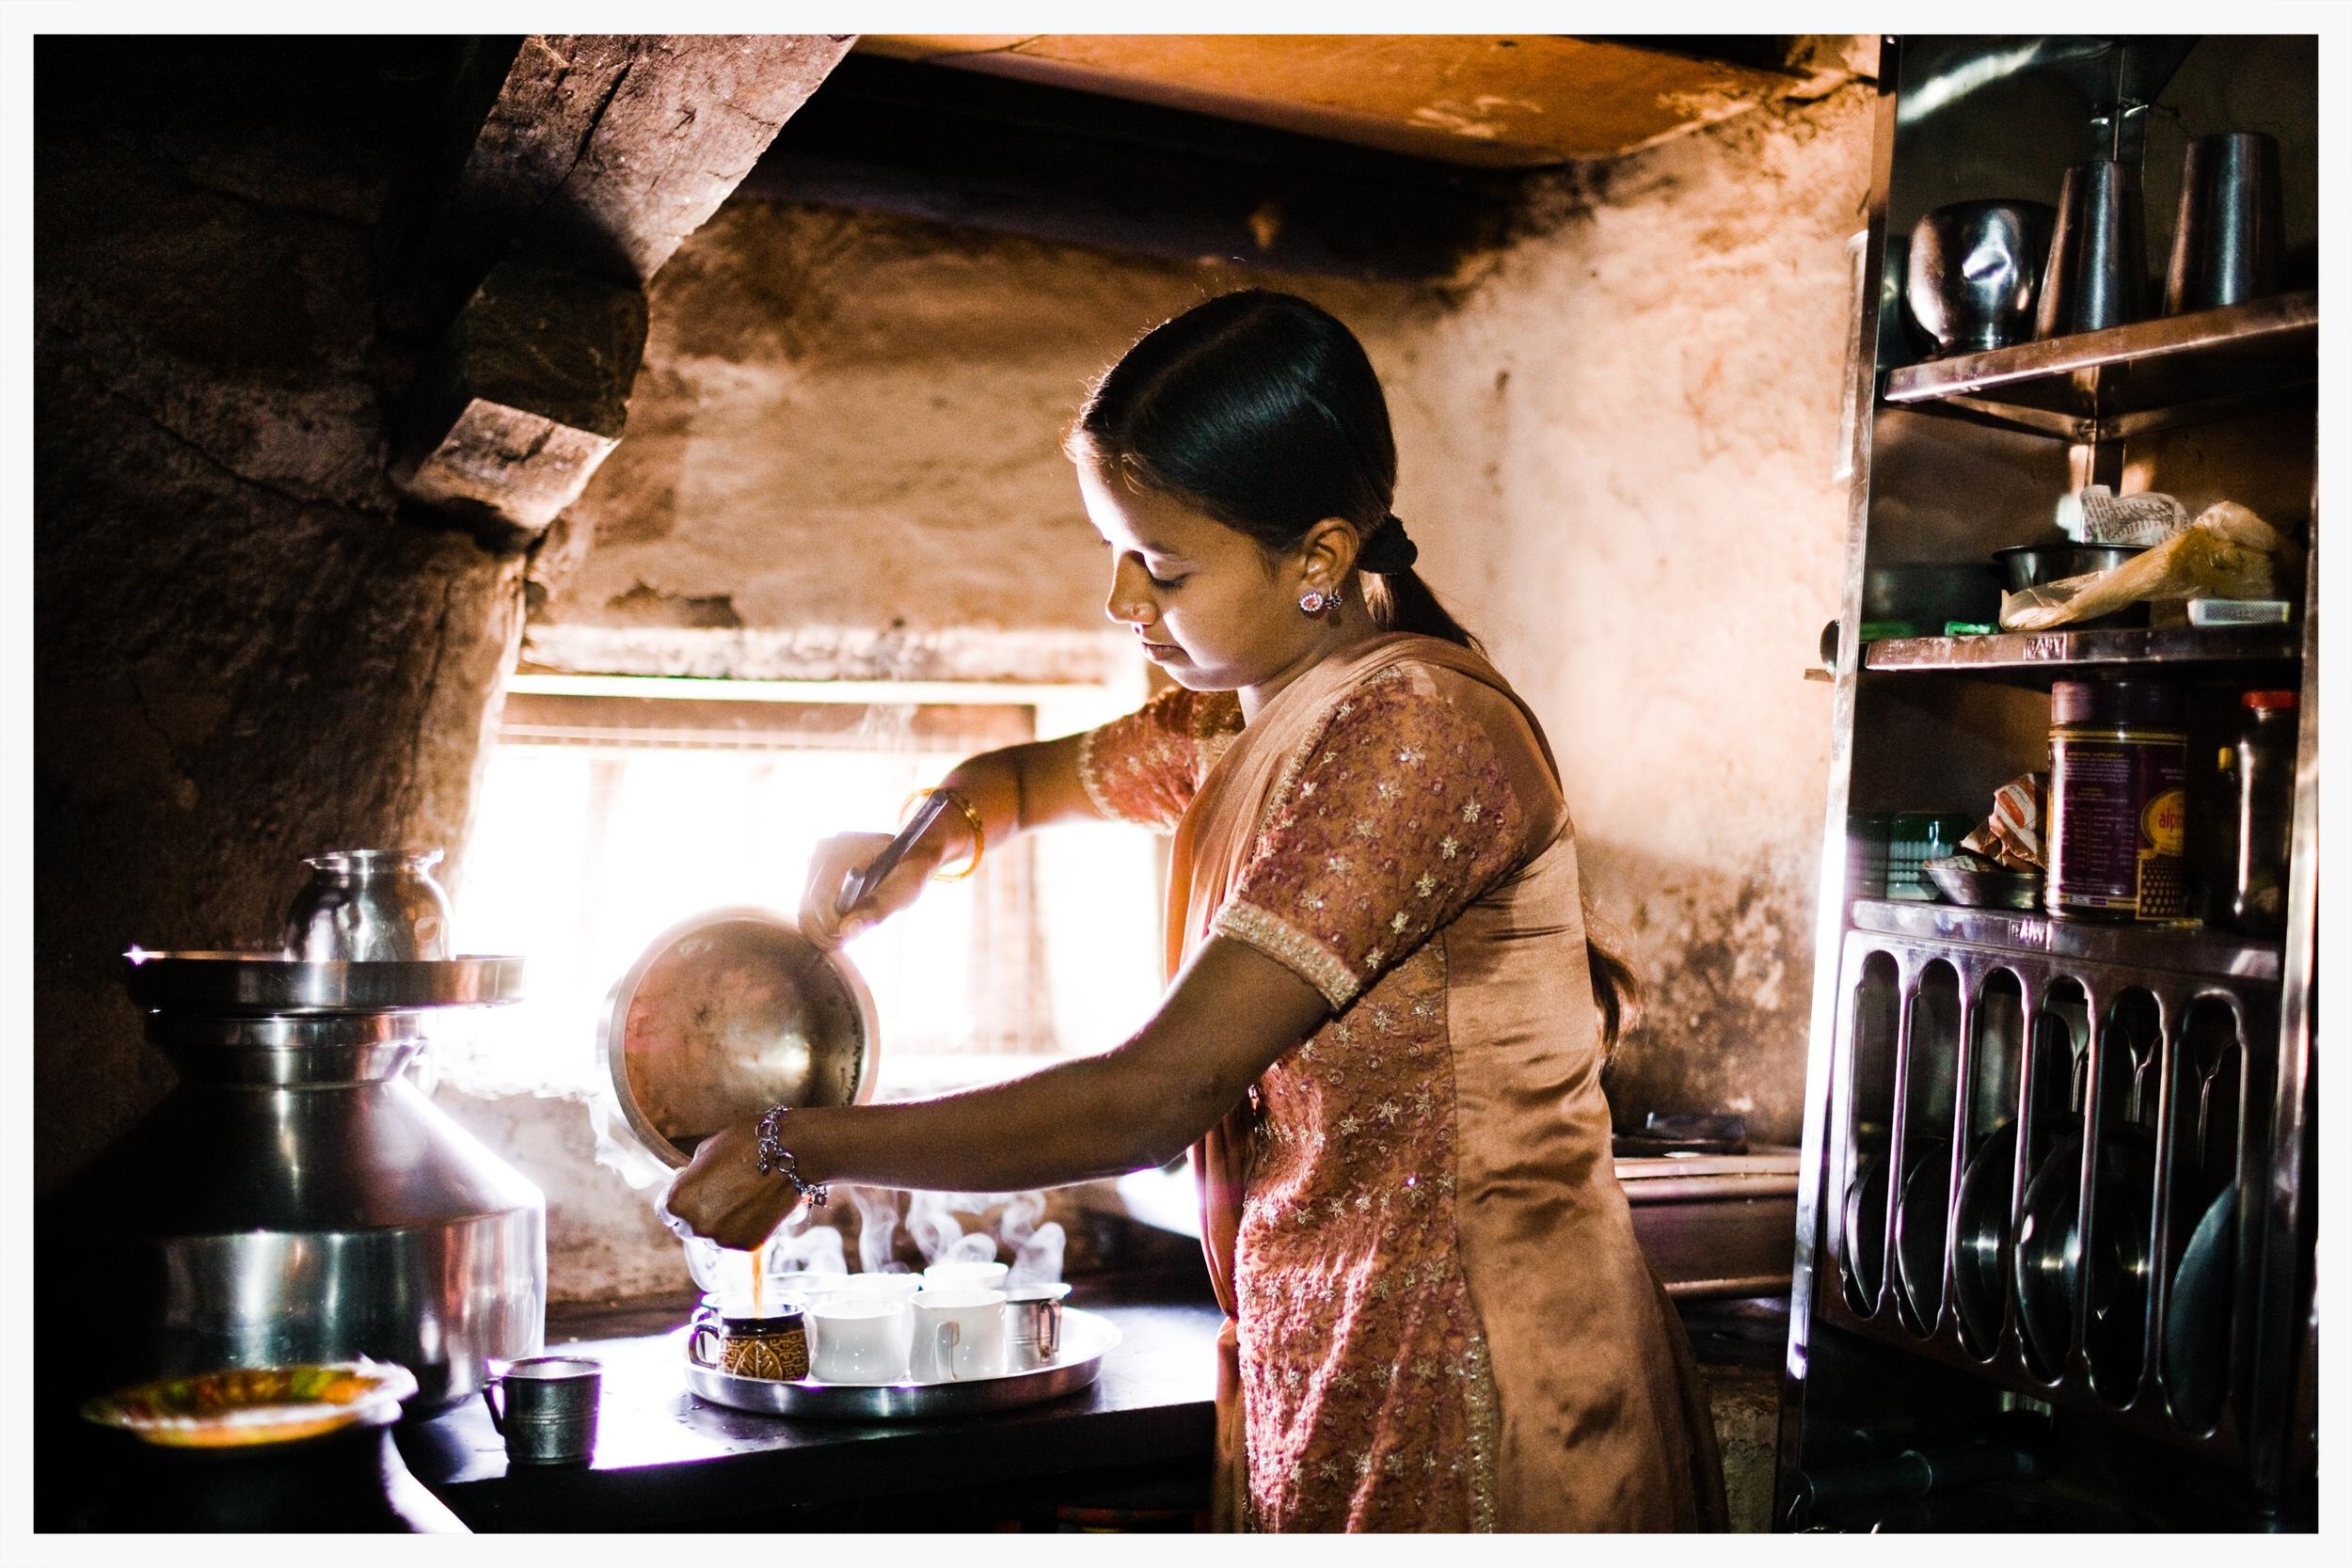 Jaya, sister of Sanju, carefully prepares chai at home for us.